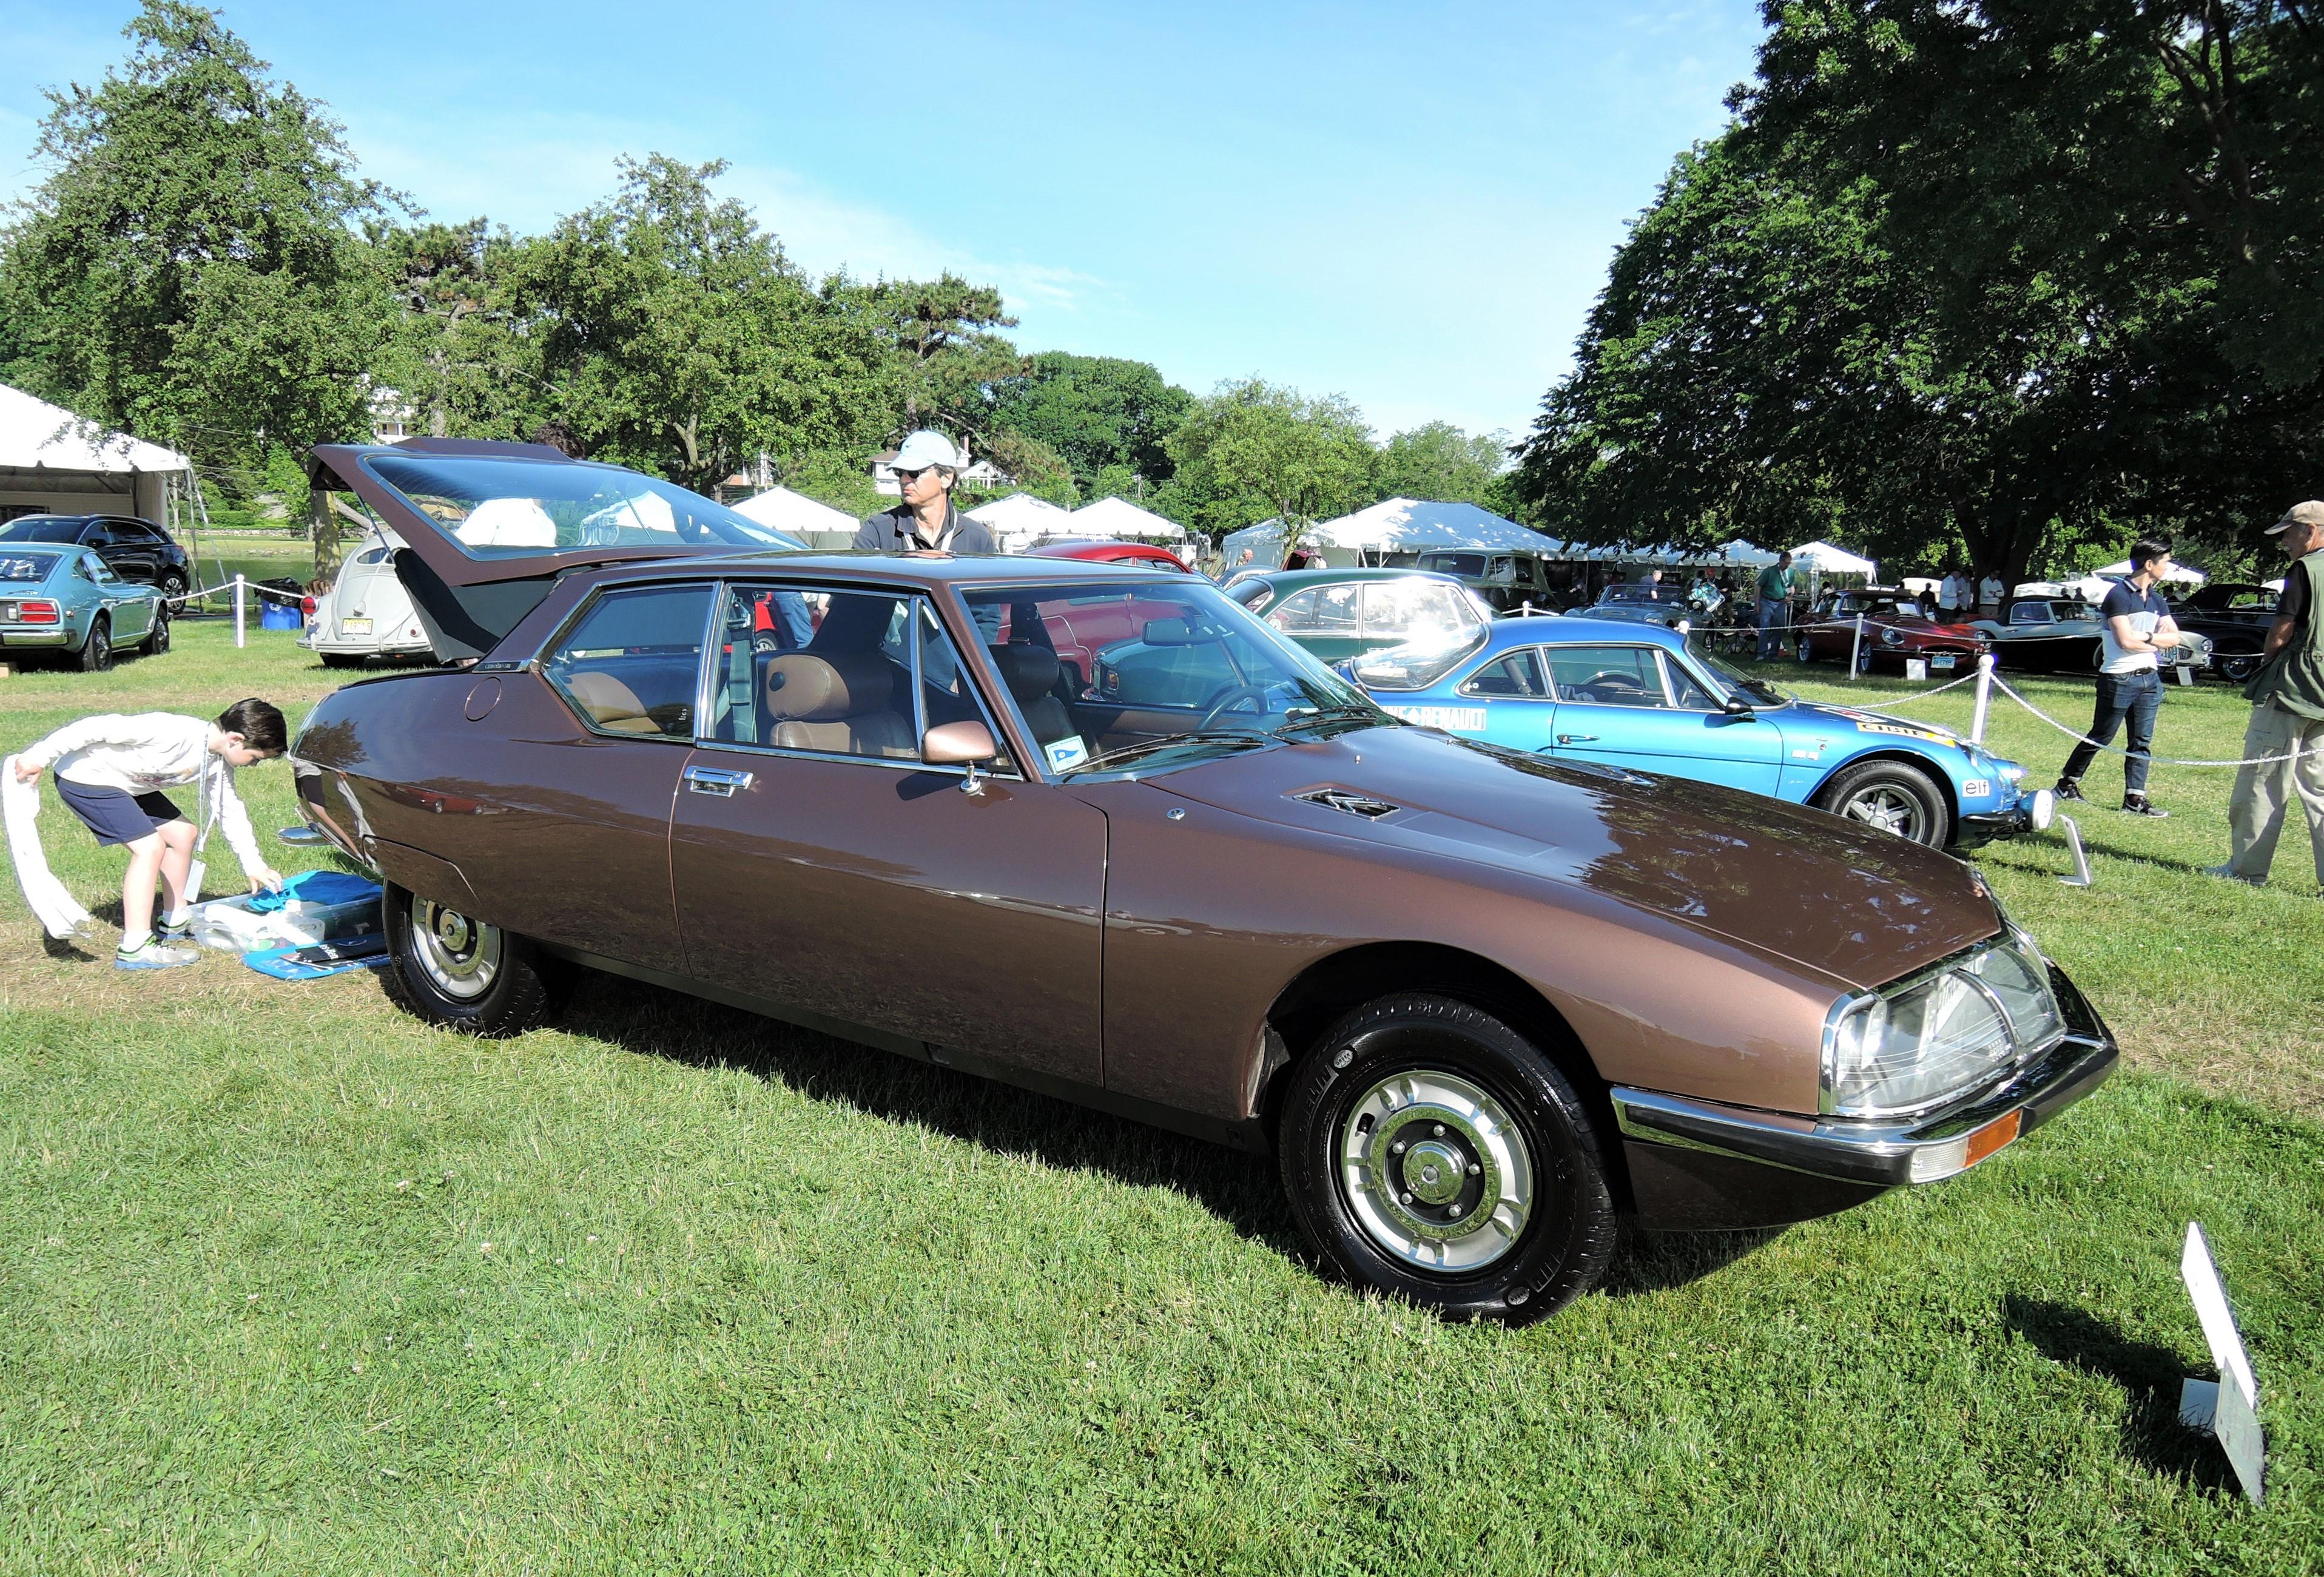 brown 1973 Citroen SM 3.0 - Greenwich Concours d'Elegance 2017